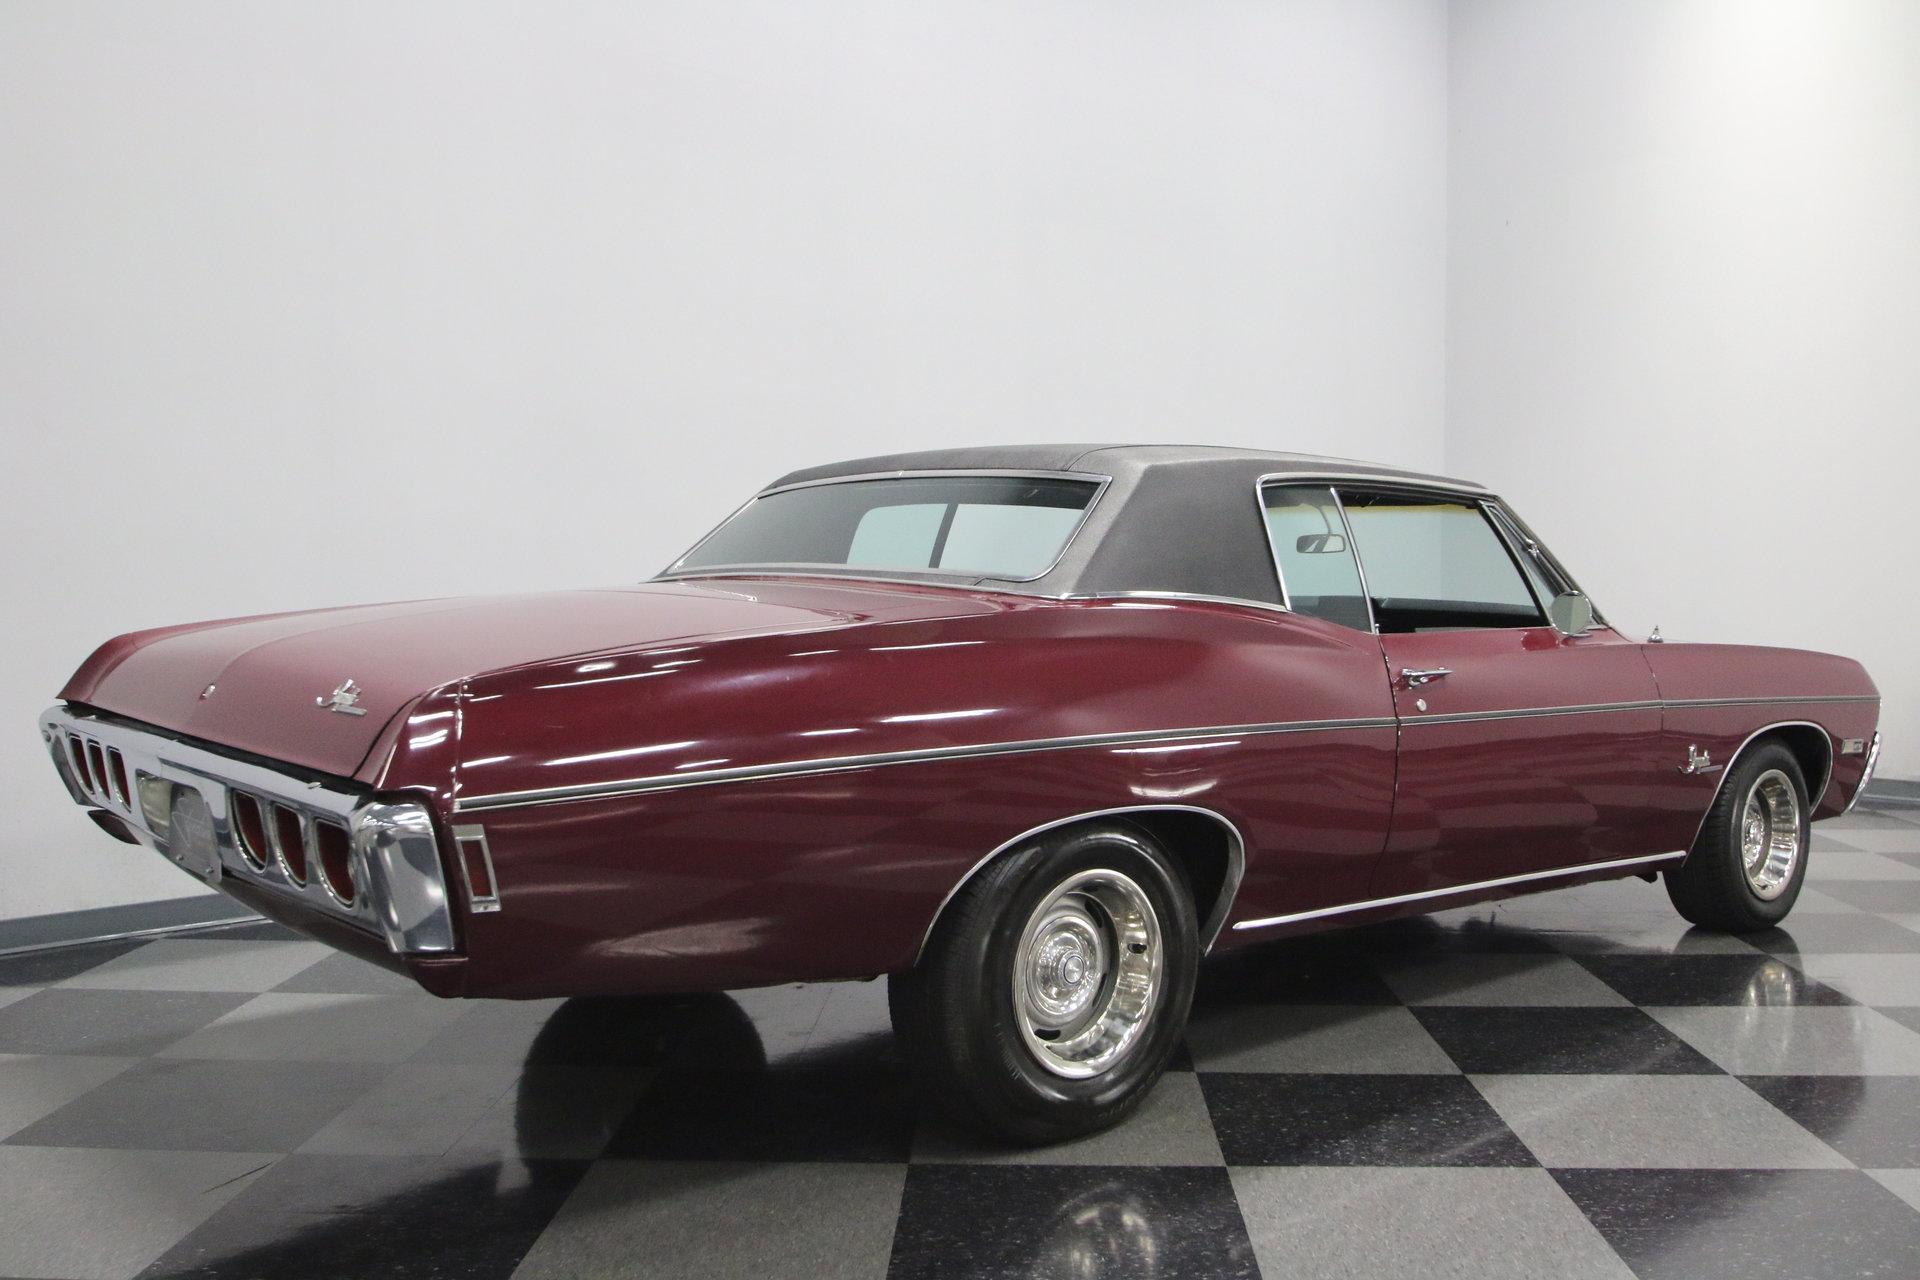 1968 Chevrolet Impala Streetside Classics The Nations Trusted 2 Door Show More Photos